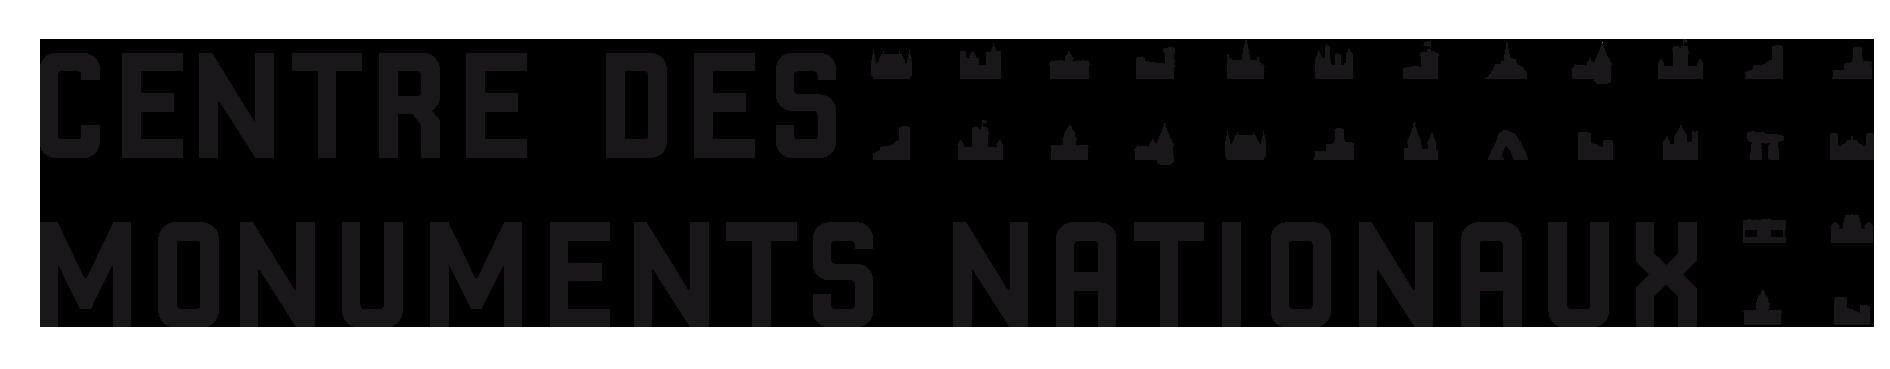 logo noir transparence